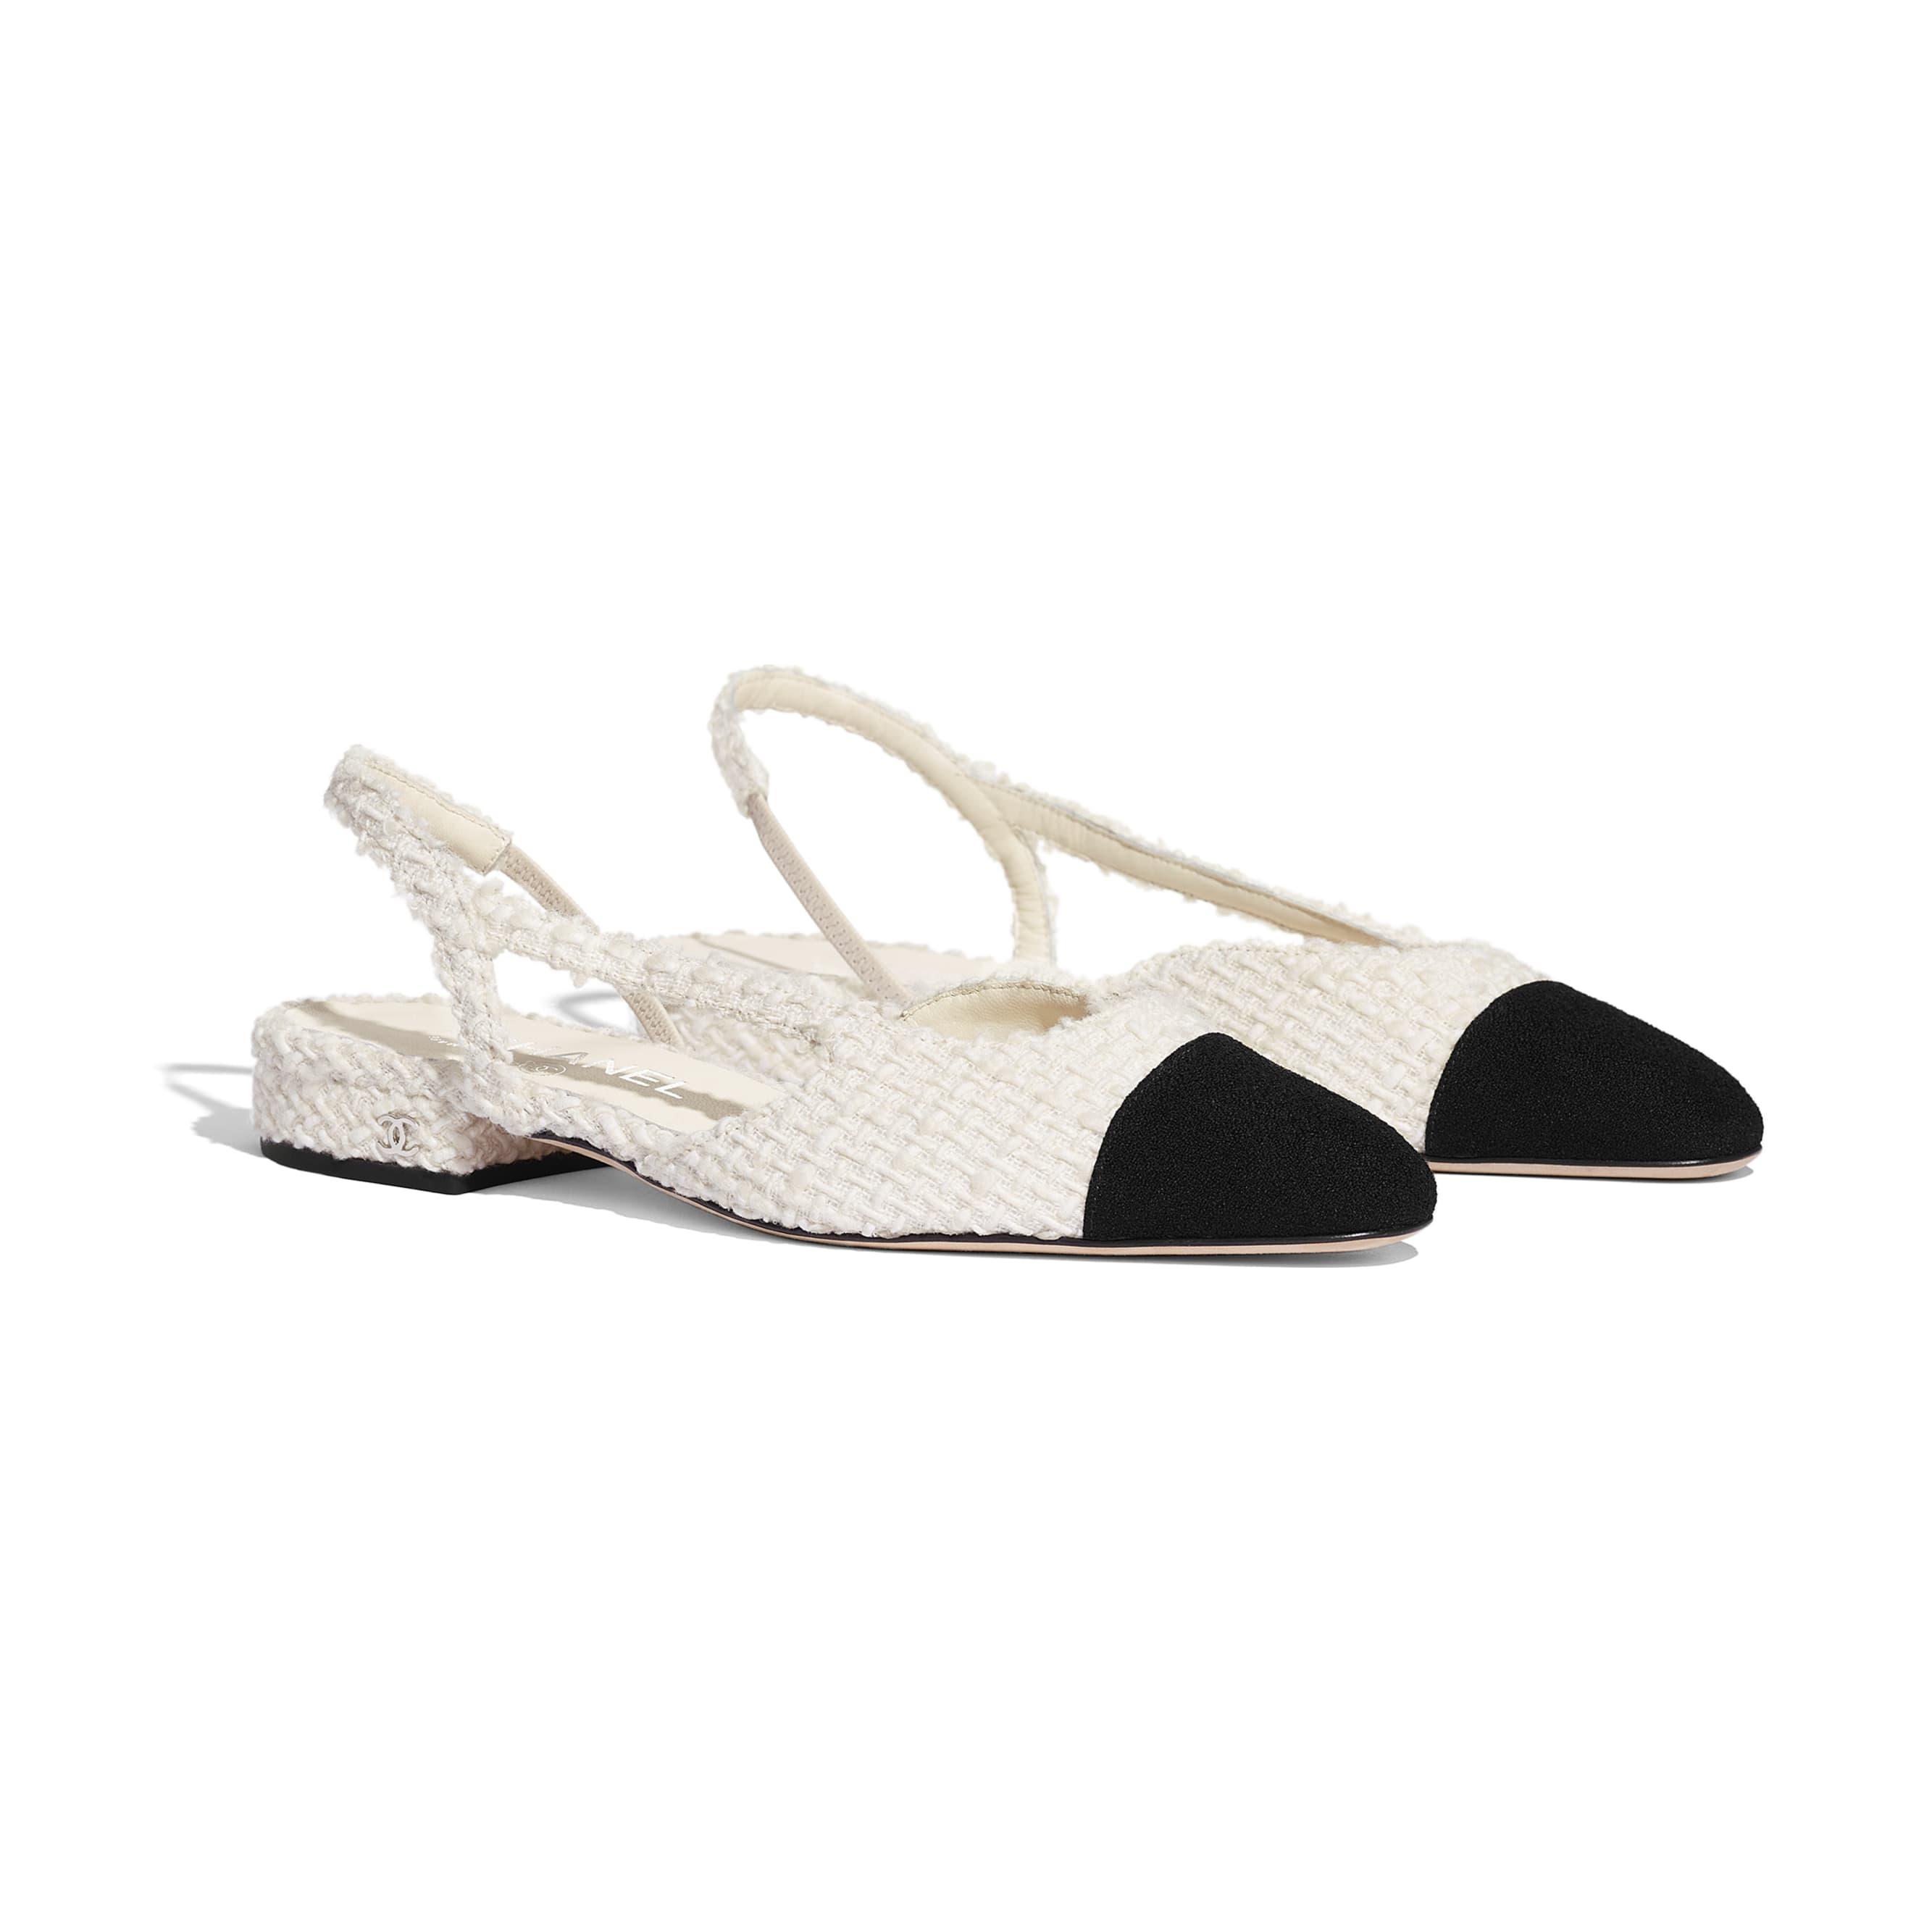 Slingbacks - White & Black - Wool Tweed - CHANEL - Alternative view - see standard sized version